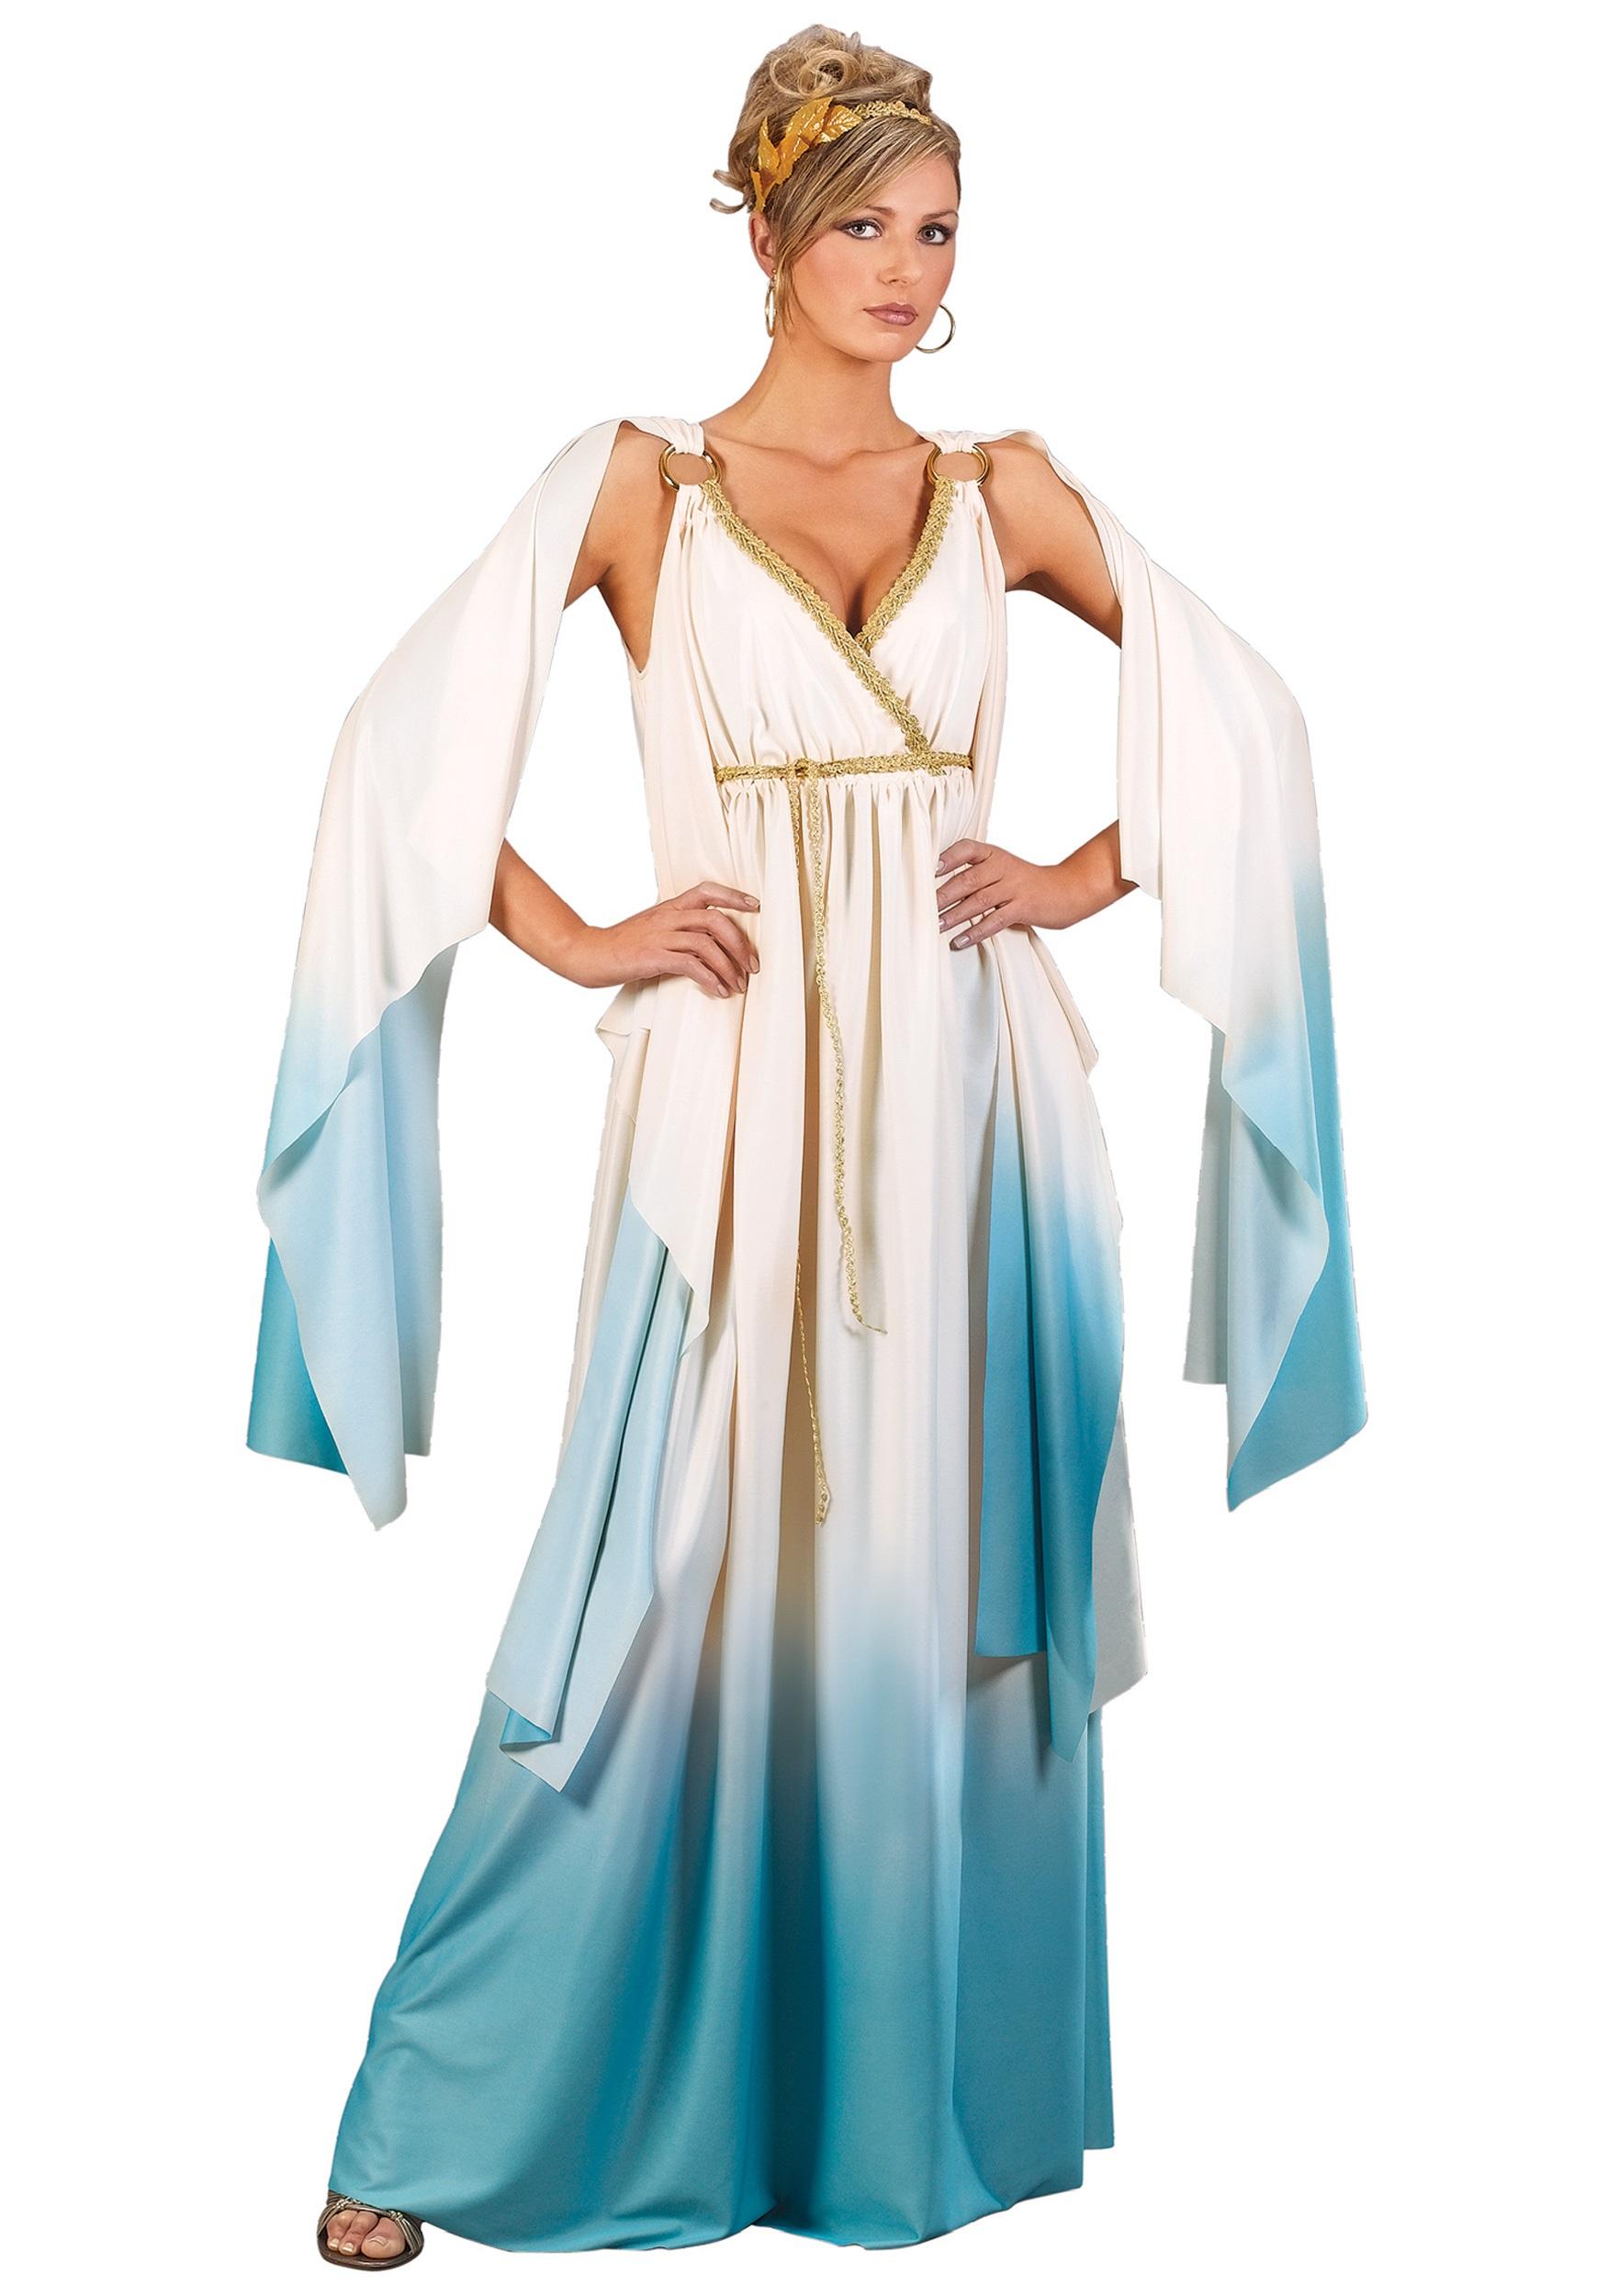 http://images.halloweencostumes.com/womens-greek-goddess-costume-zoom.jpg